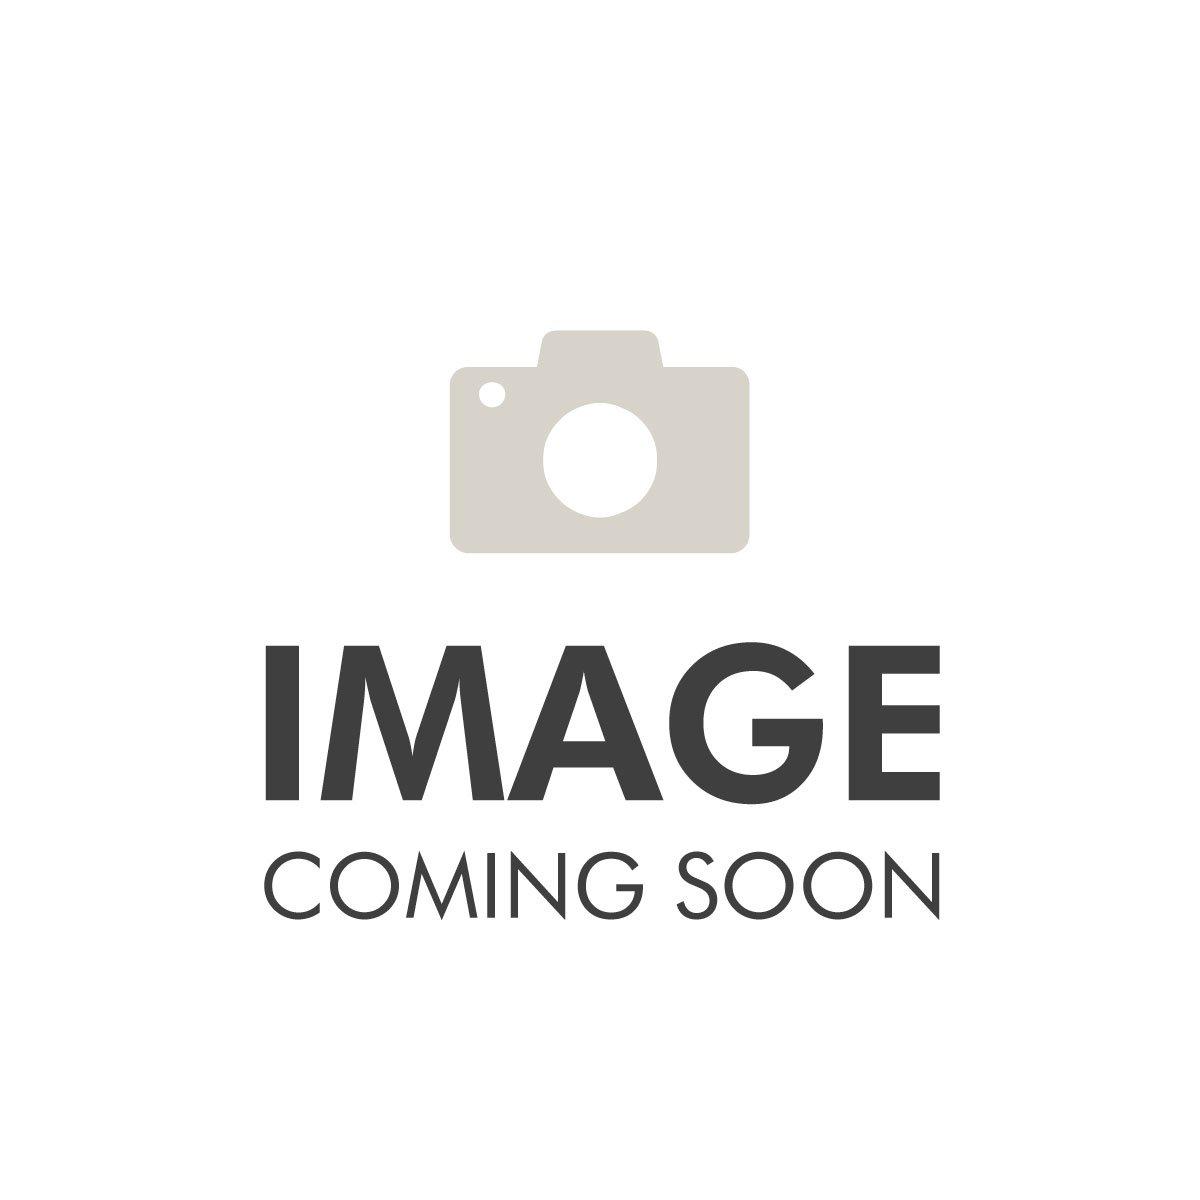 L'Oreal Loreal Permanent Hair Color Prodigy 7.31 Sahara